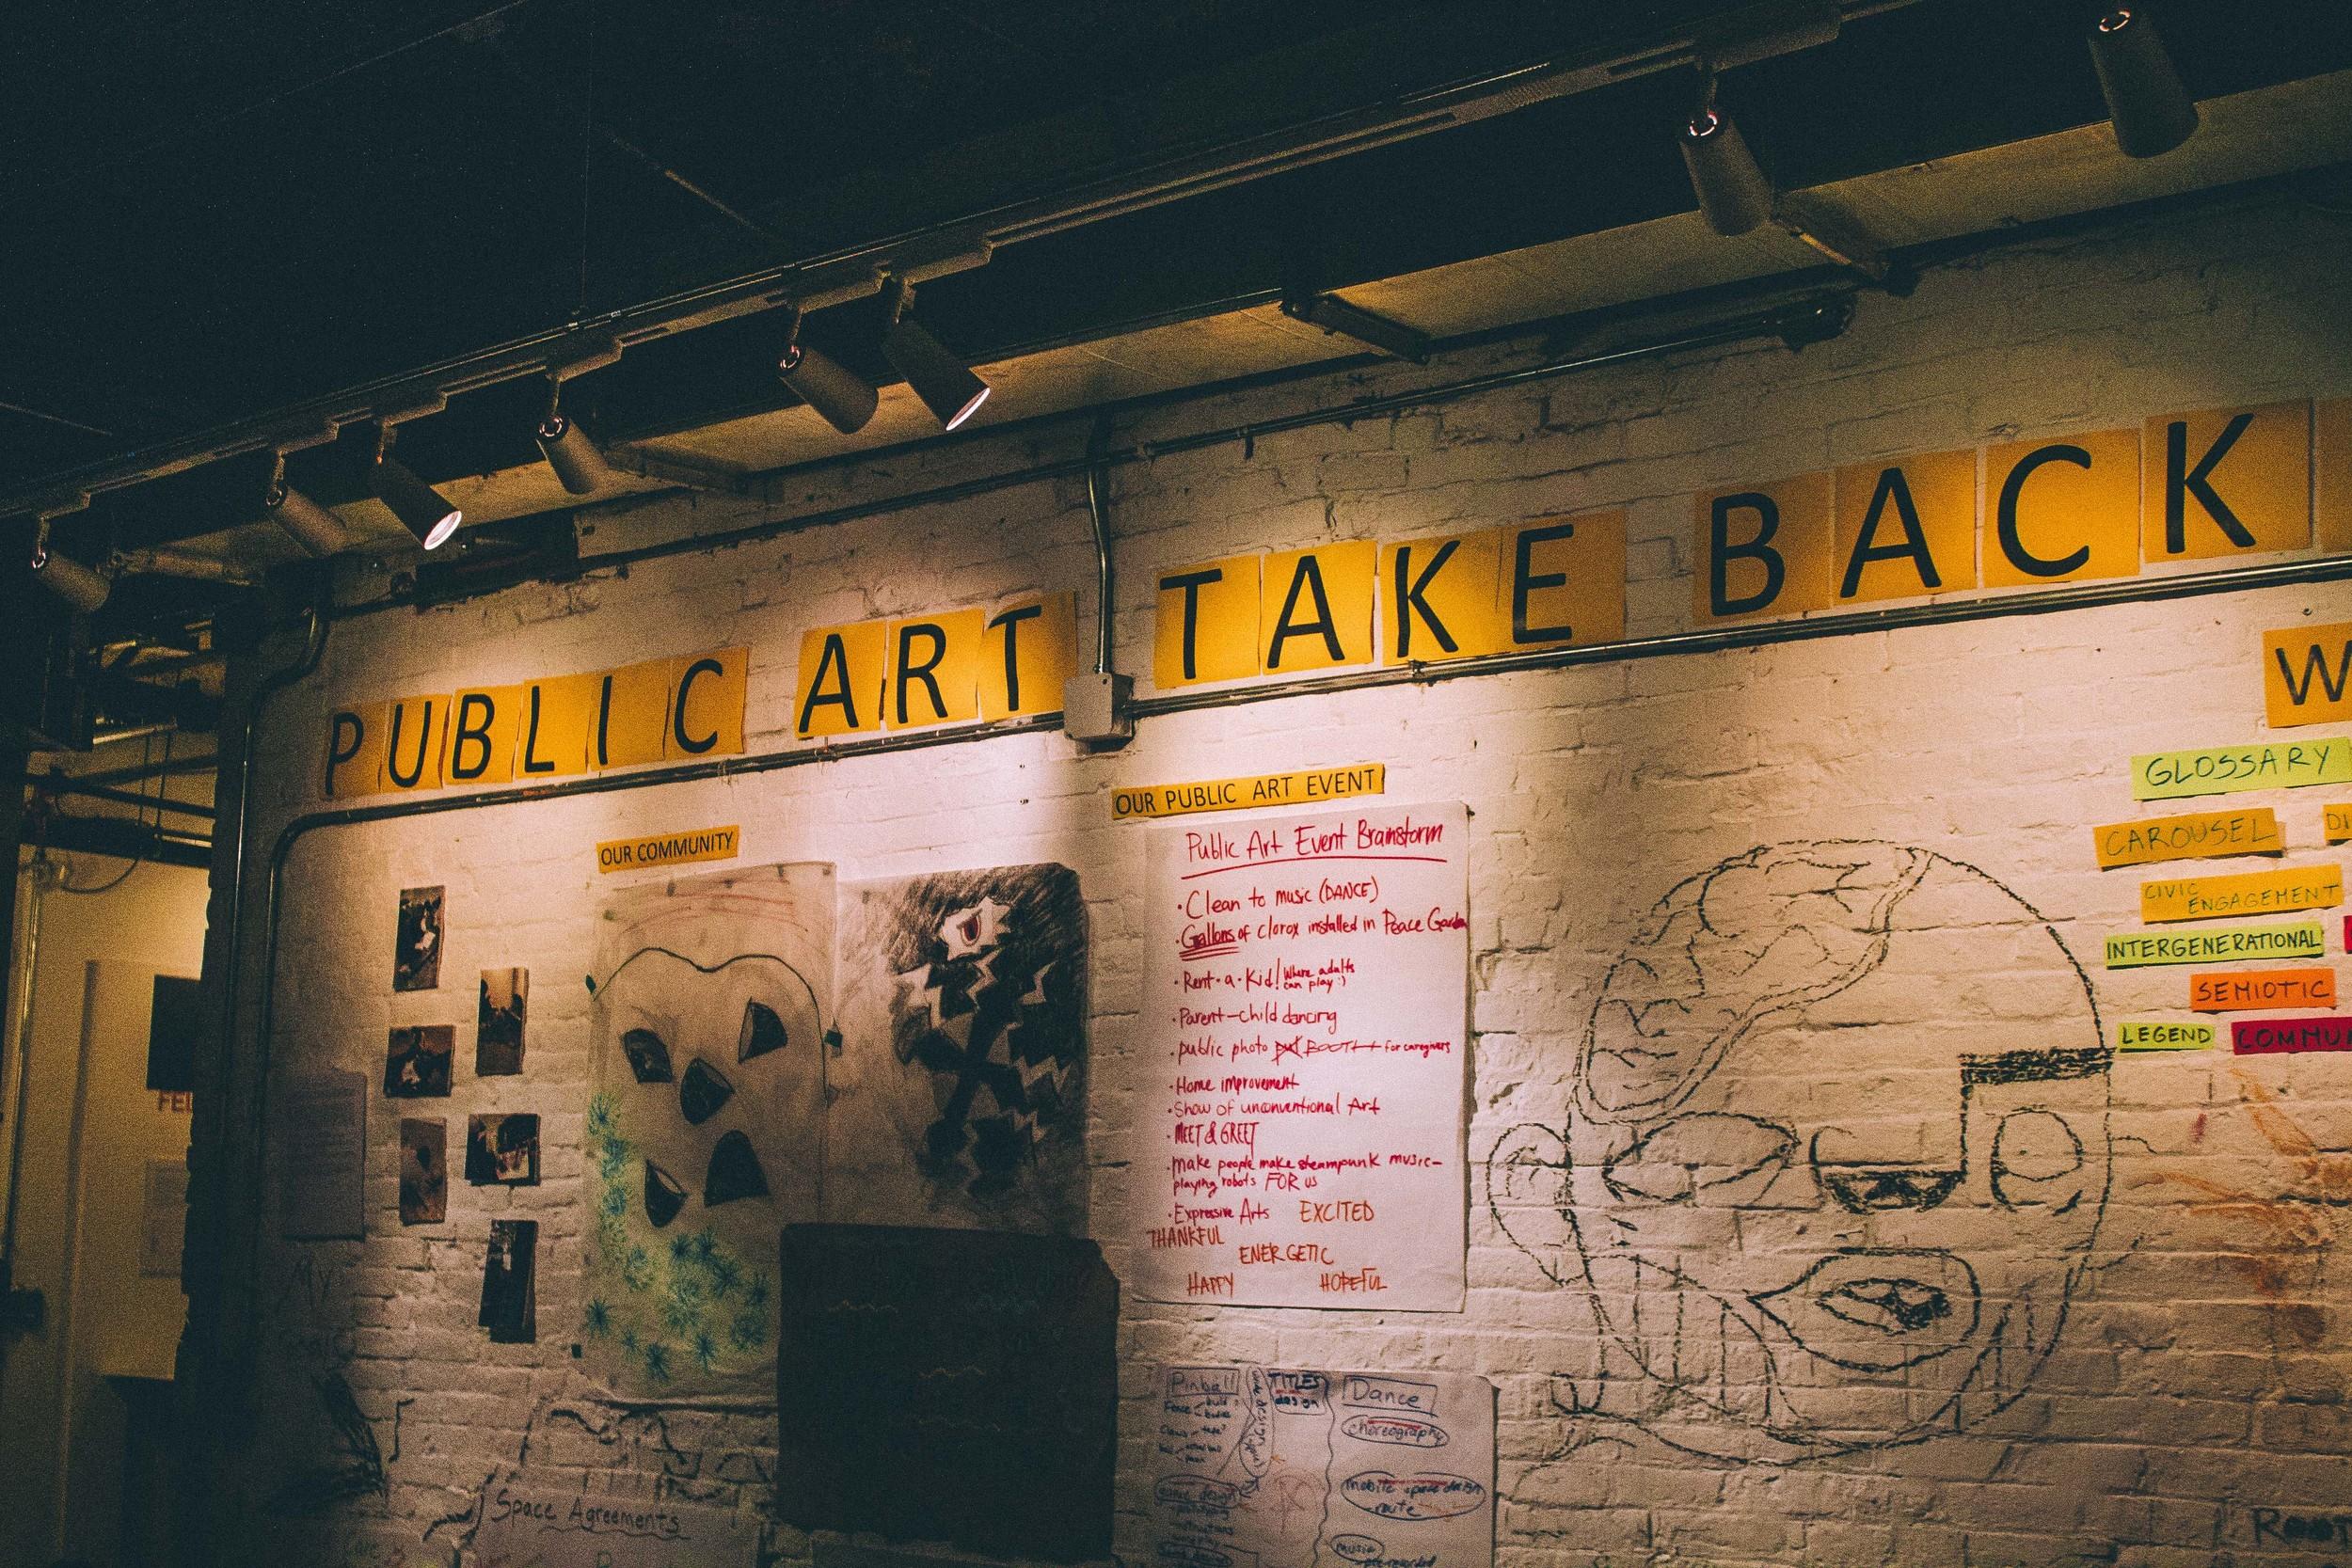 Public Art Take Back_1_term 1.jpg